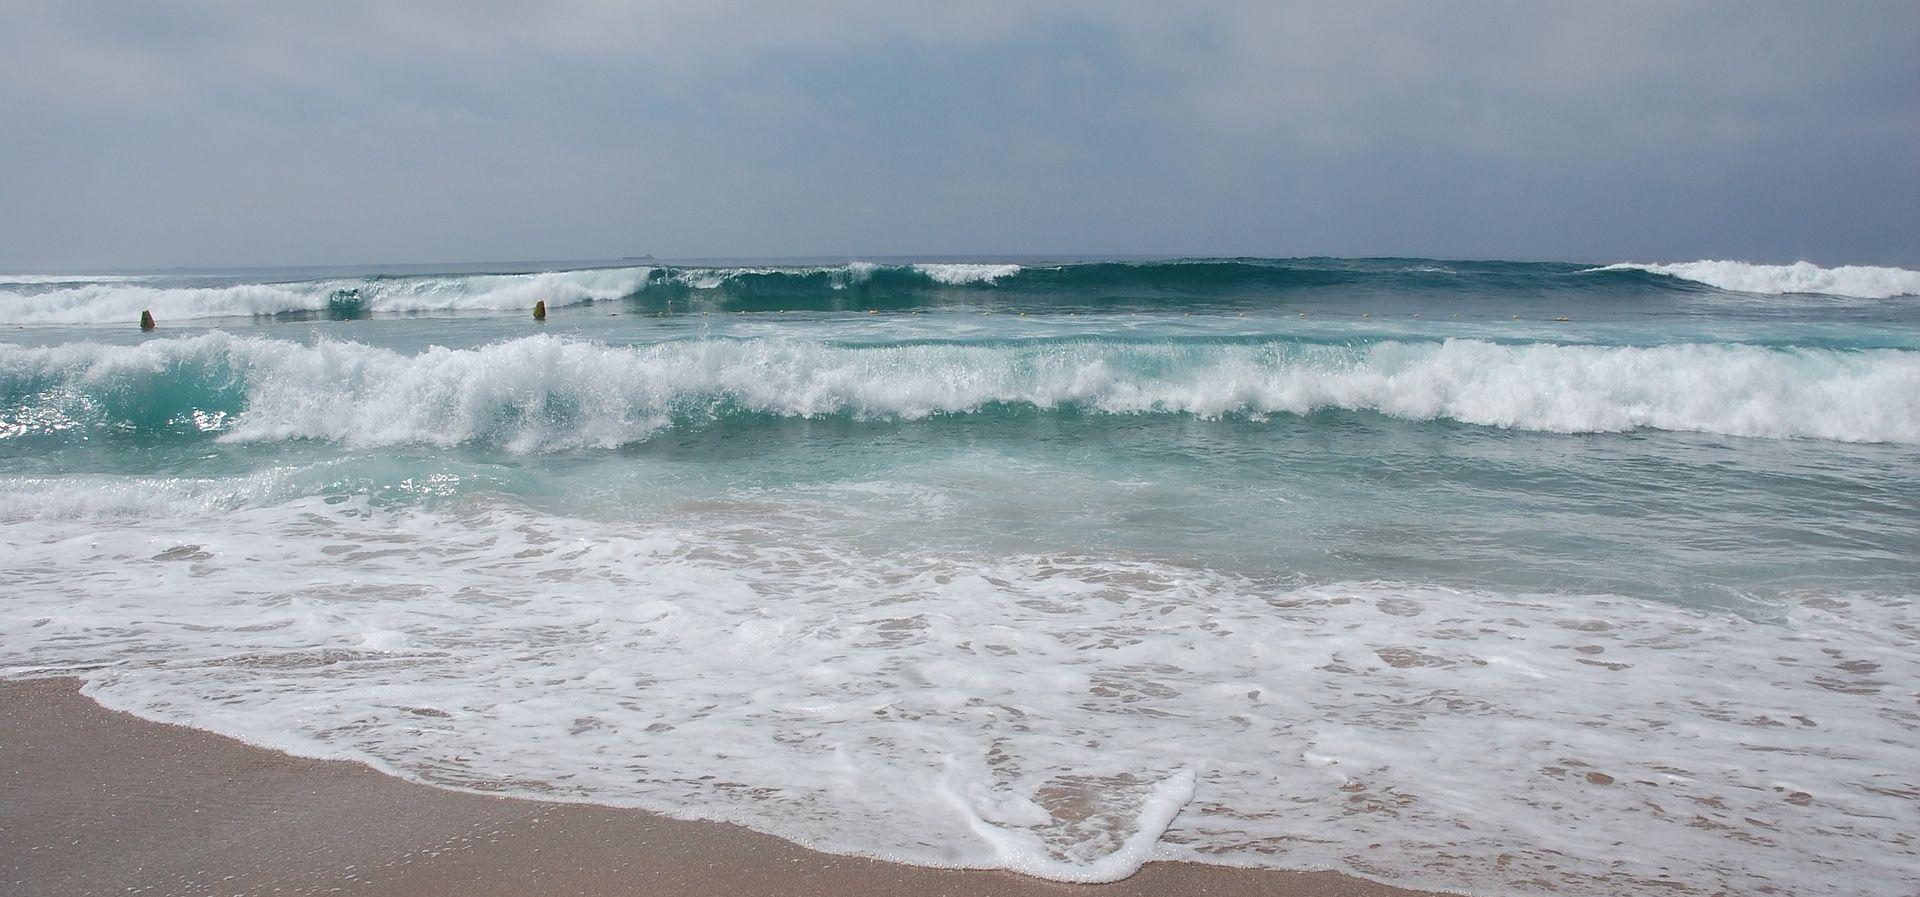 JUŽNA KOREJA Prevrnuo se ribarski brod – deset poginulih, još desetak nestalih